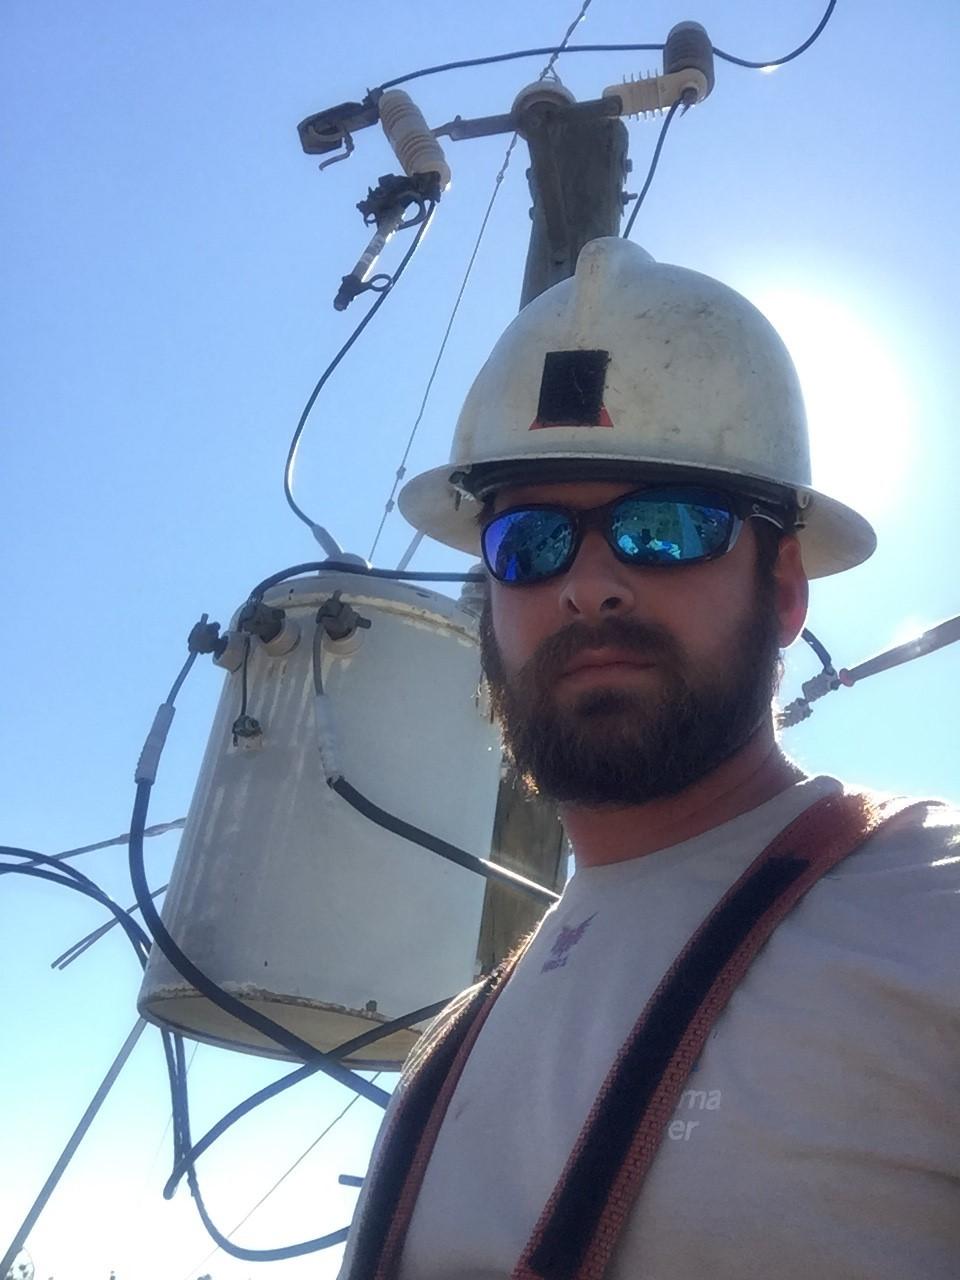 John Burge working near power line